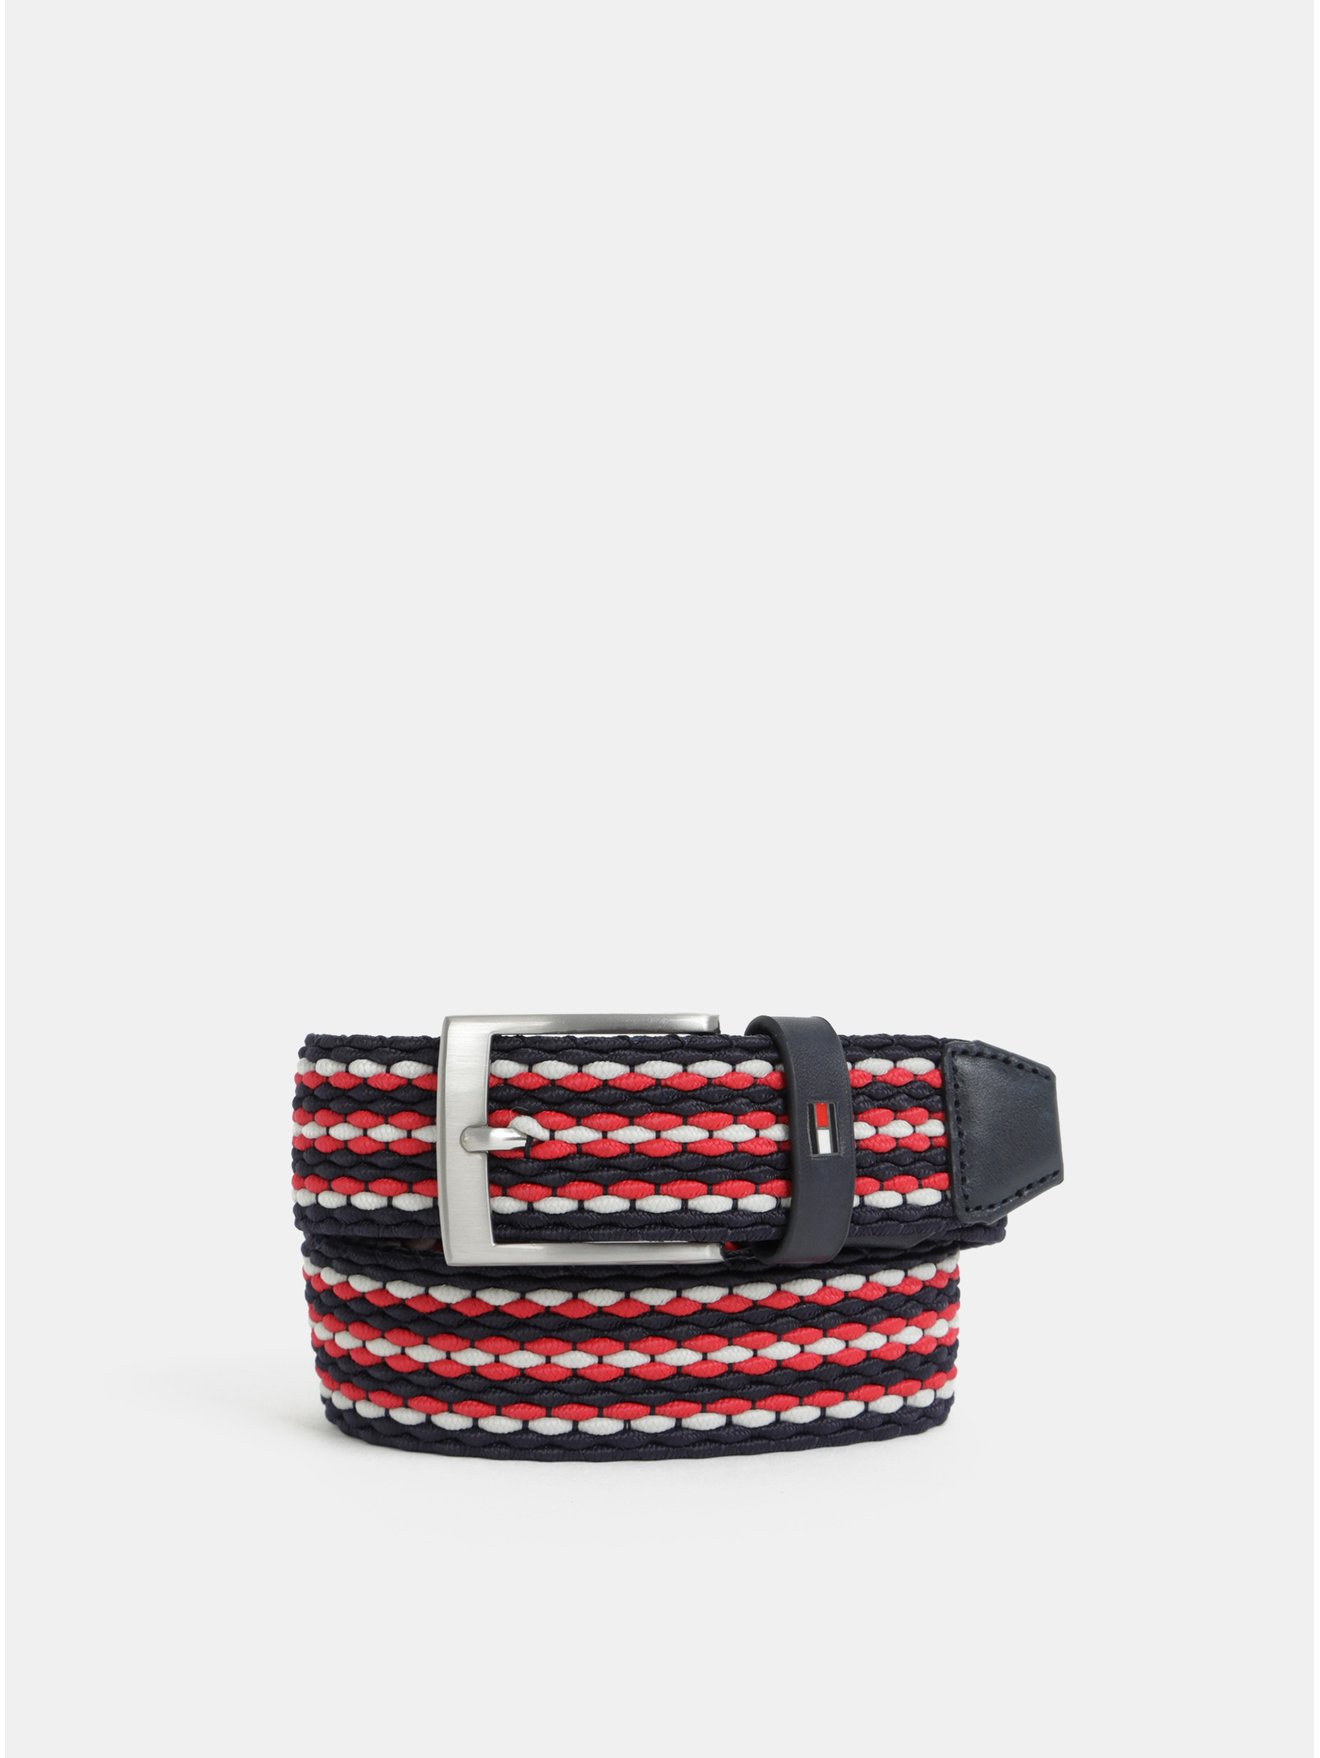 Červeno-černý pánský pásek Tommy Hilfiger